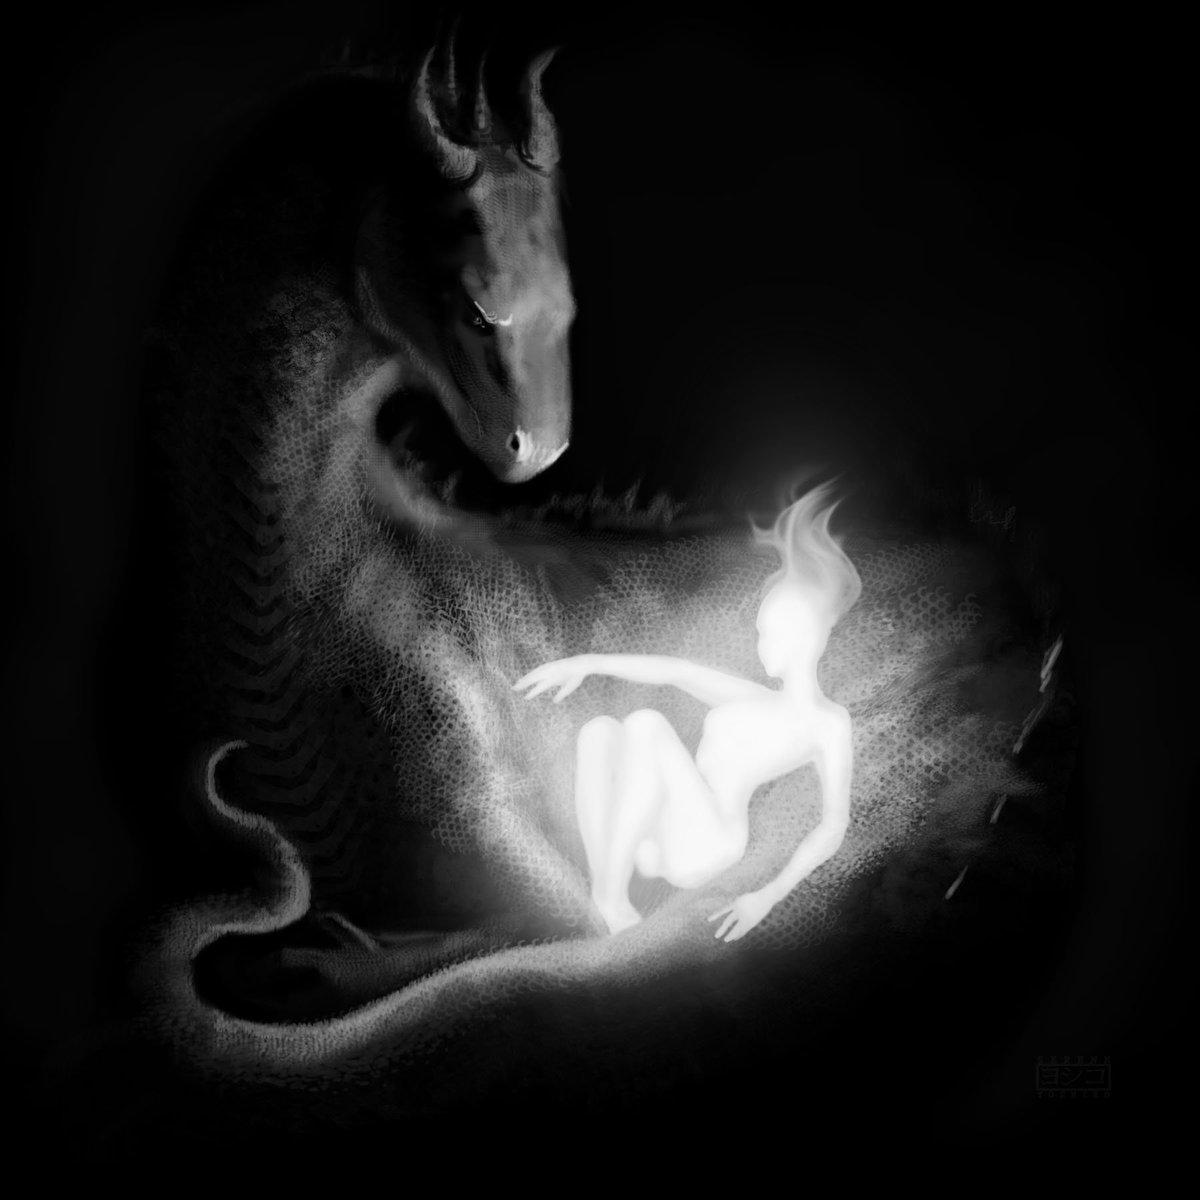 I'm a sucker for dragons.. https://t.co/ojJy8dk5Pf https://t.co/OvlmCBsqDw